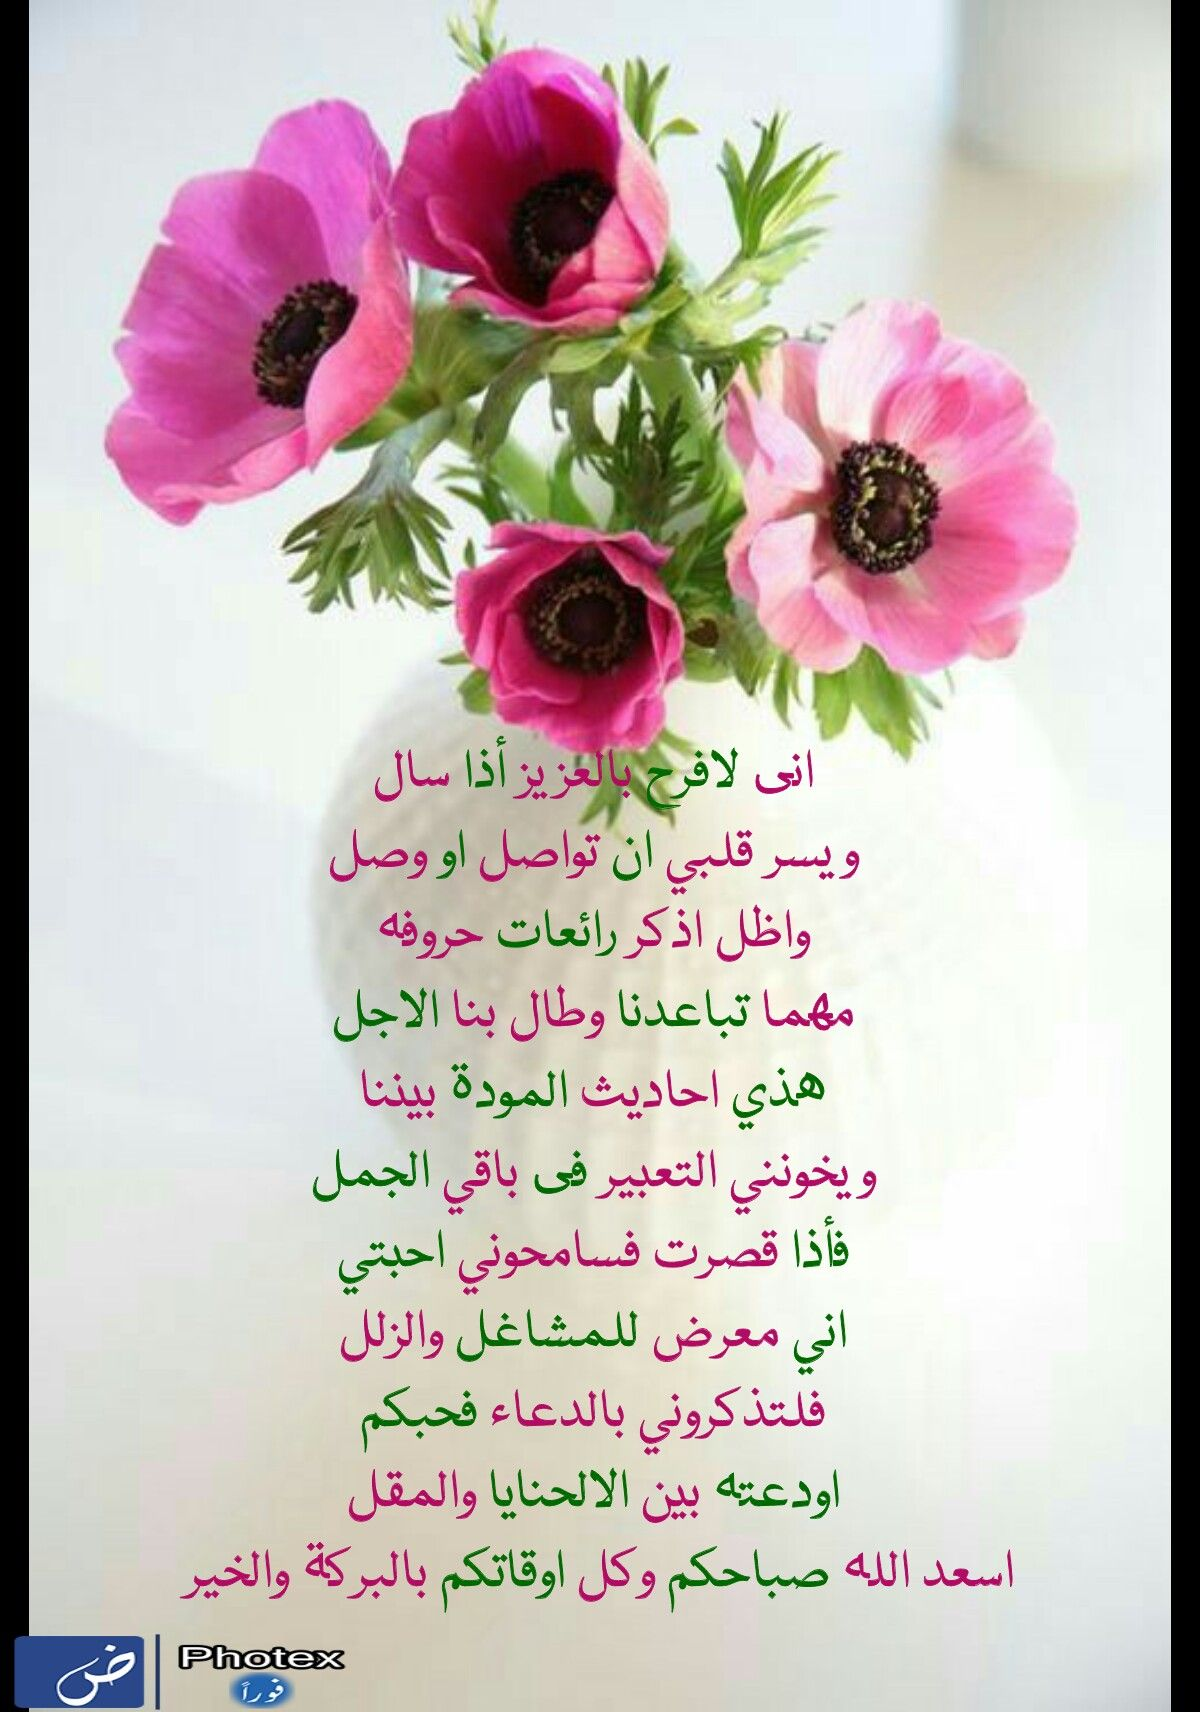 Pin By Hanan Allam On Hanan Morning Images Morning Morning Beautiful Morning